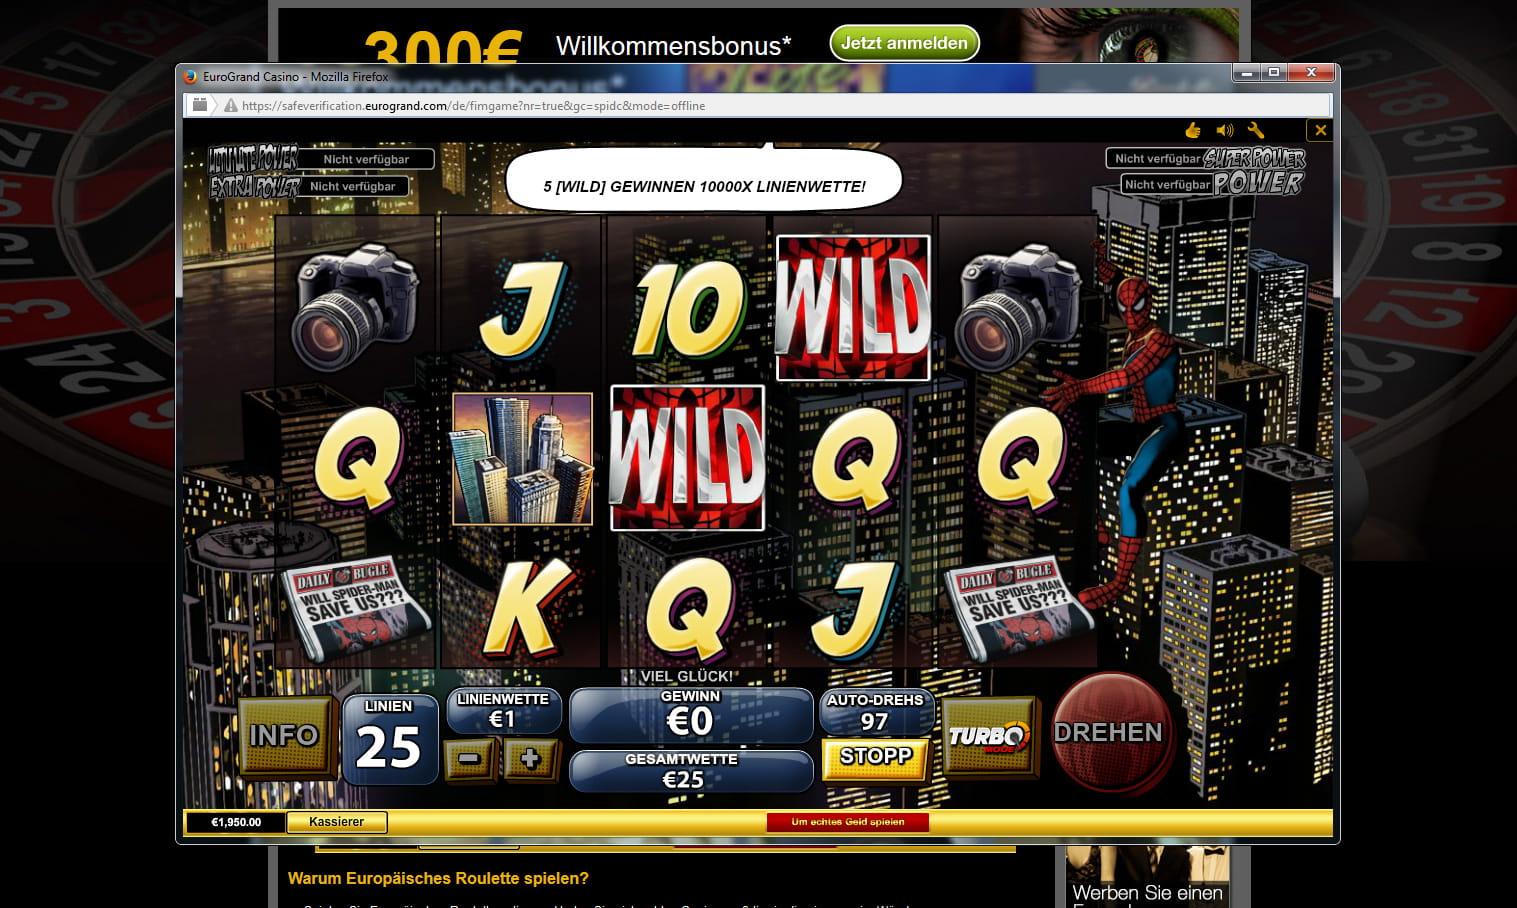 mr green minimum auszahlung casino